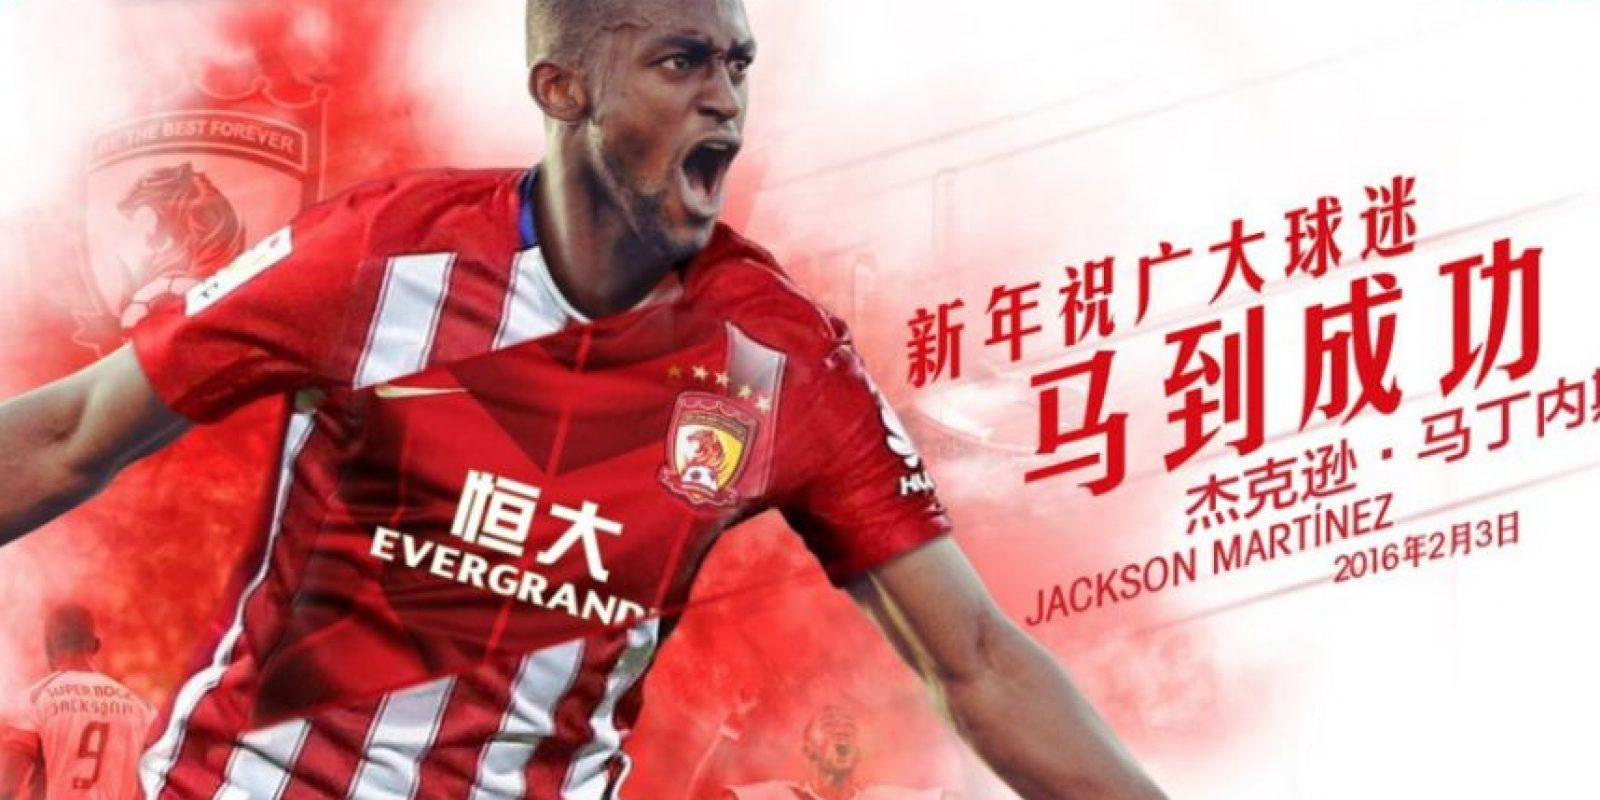 Foto:Tomado del Twitter oficial del Guangzhou Evergande